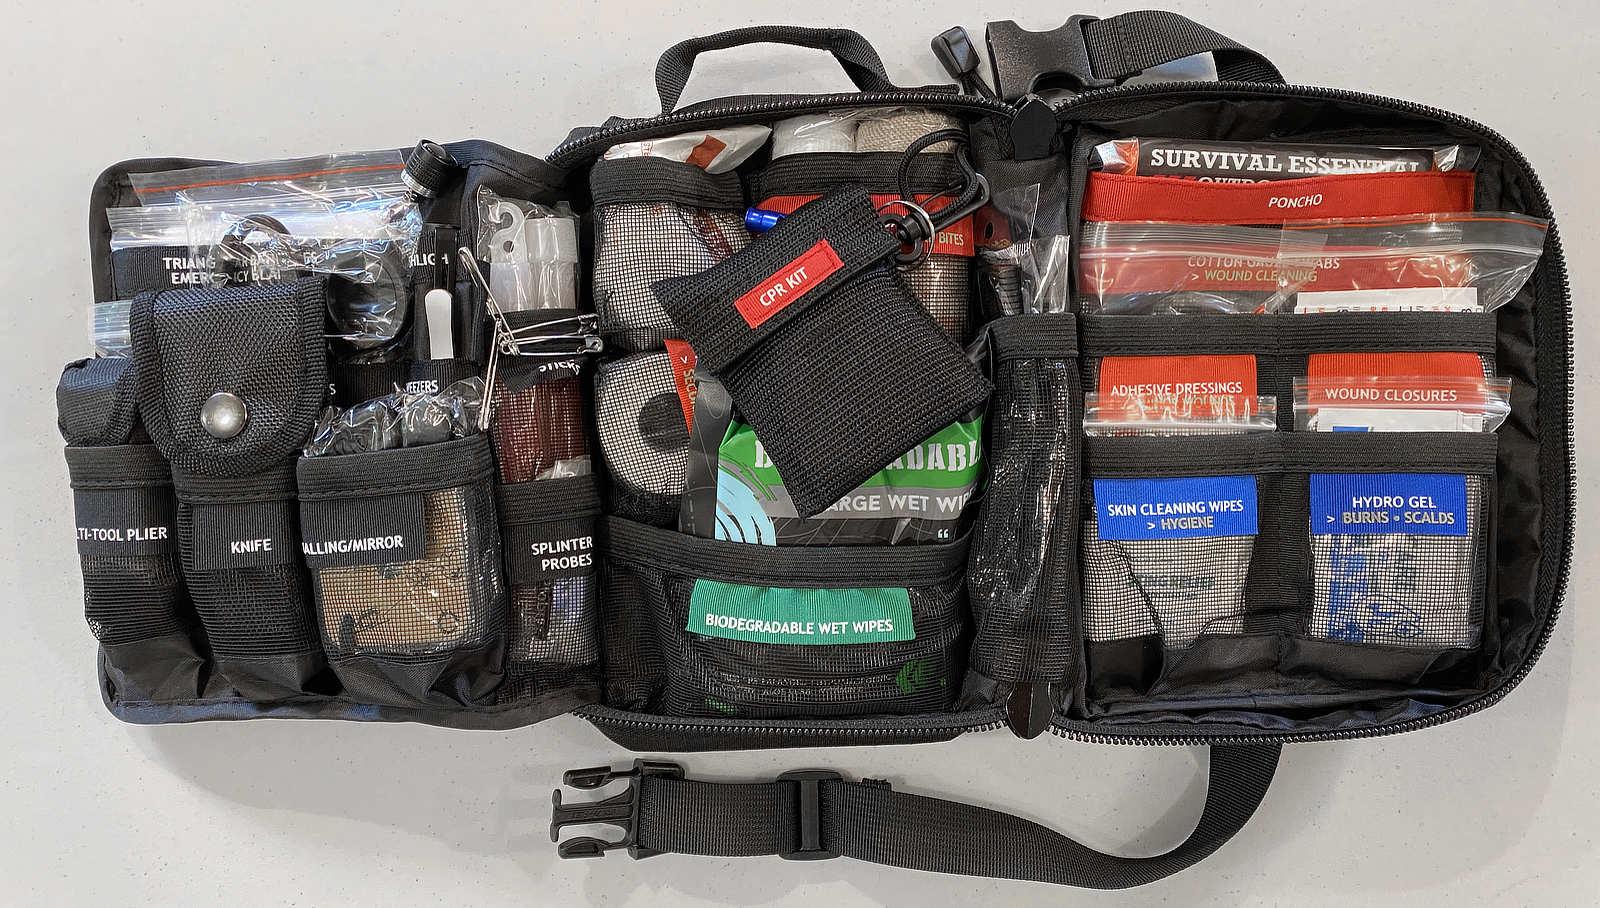 Surviveware Survival First Aid Kit nice bag.